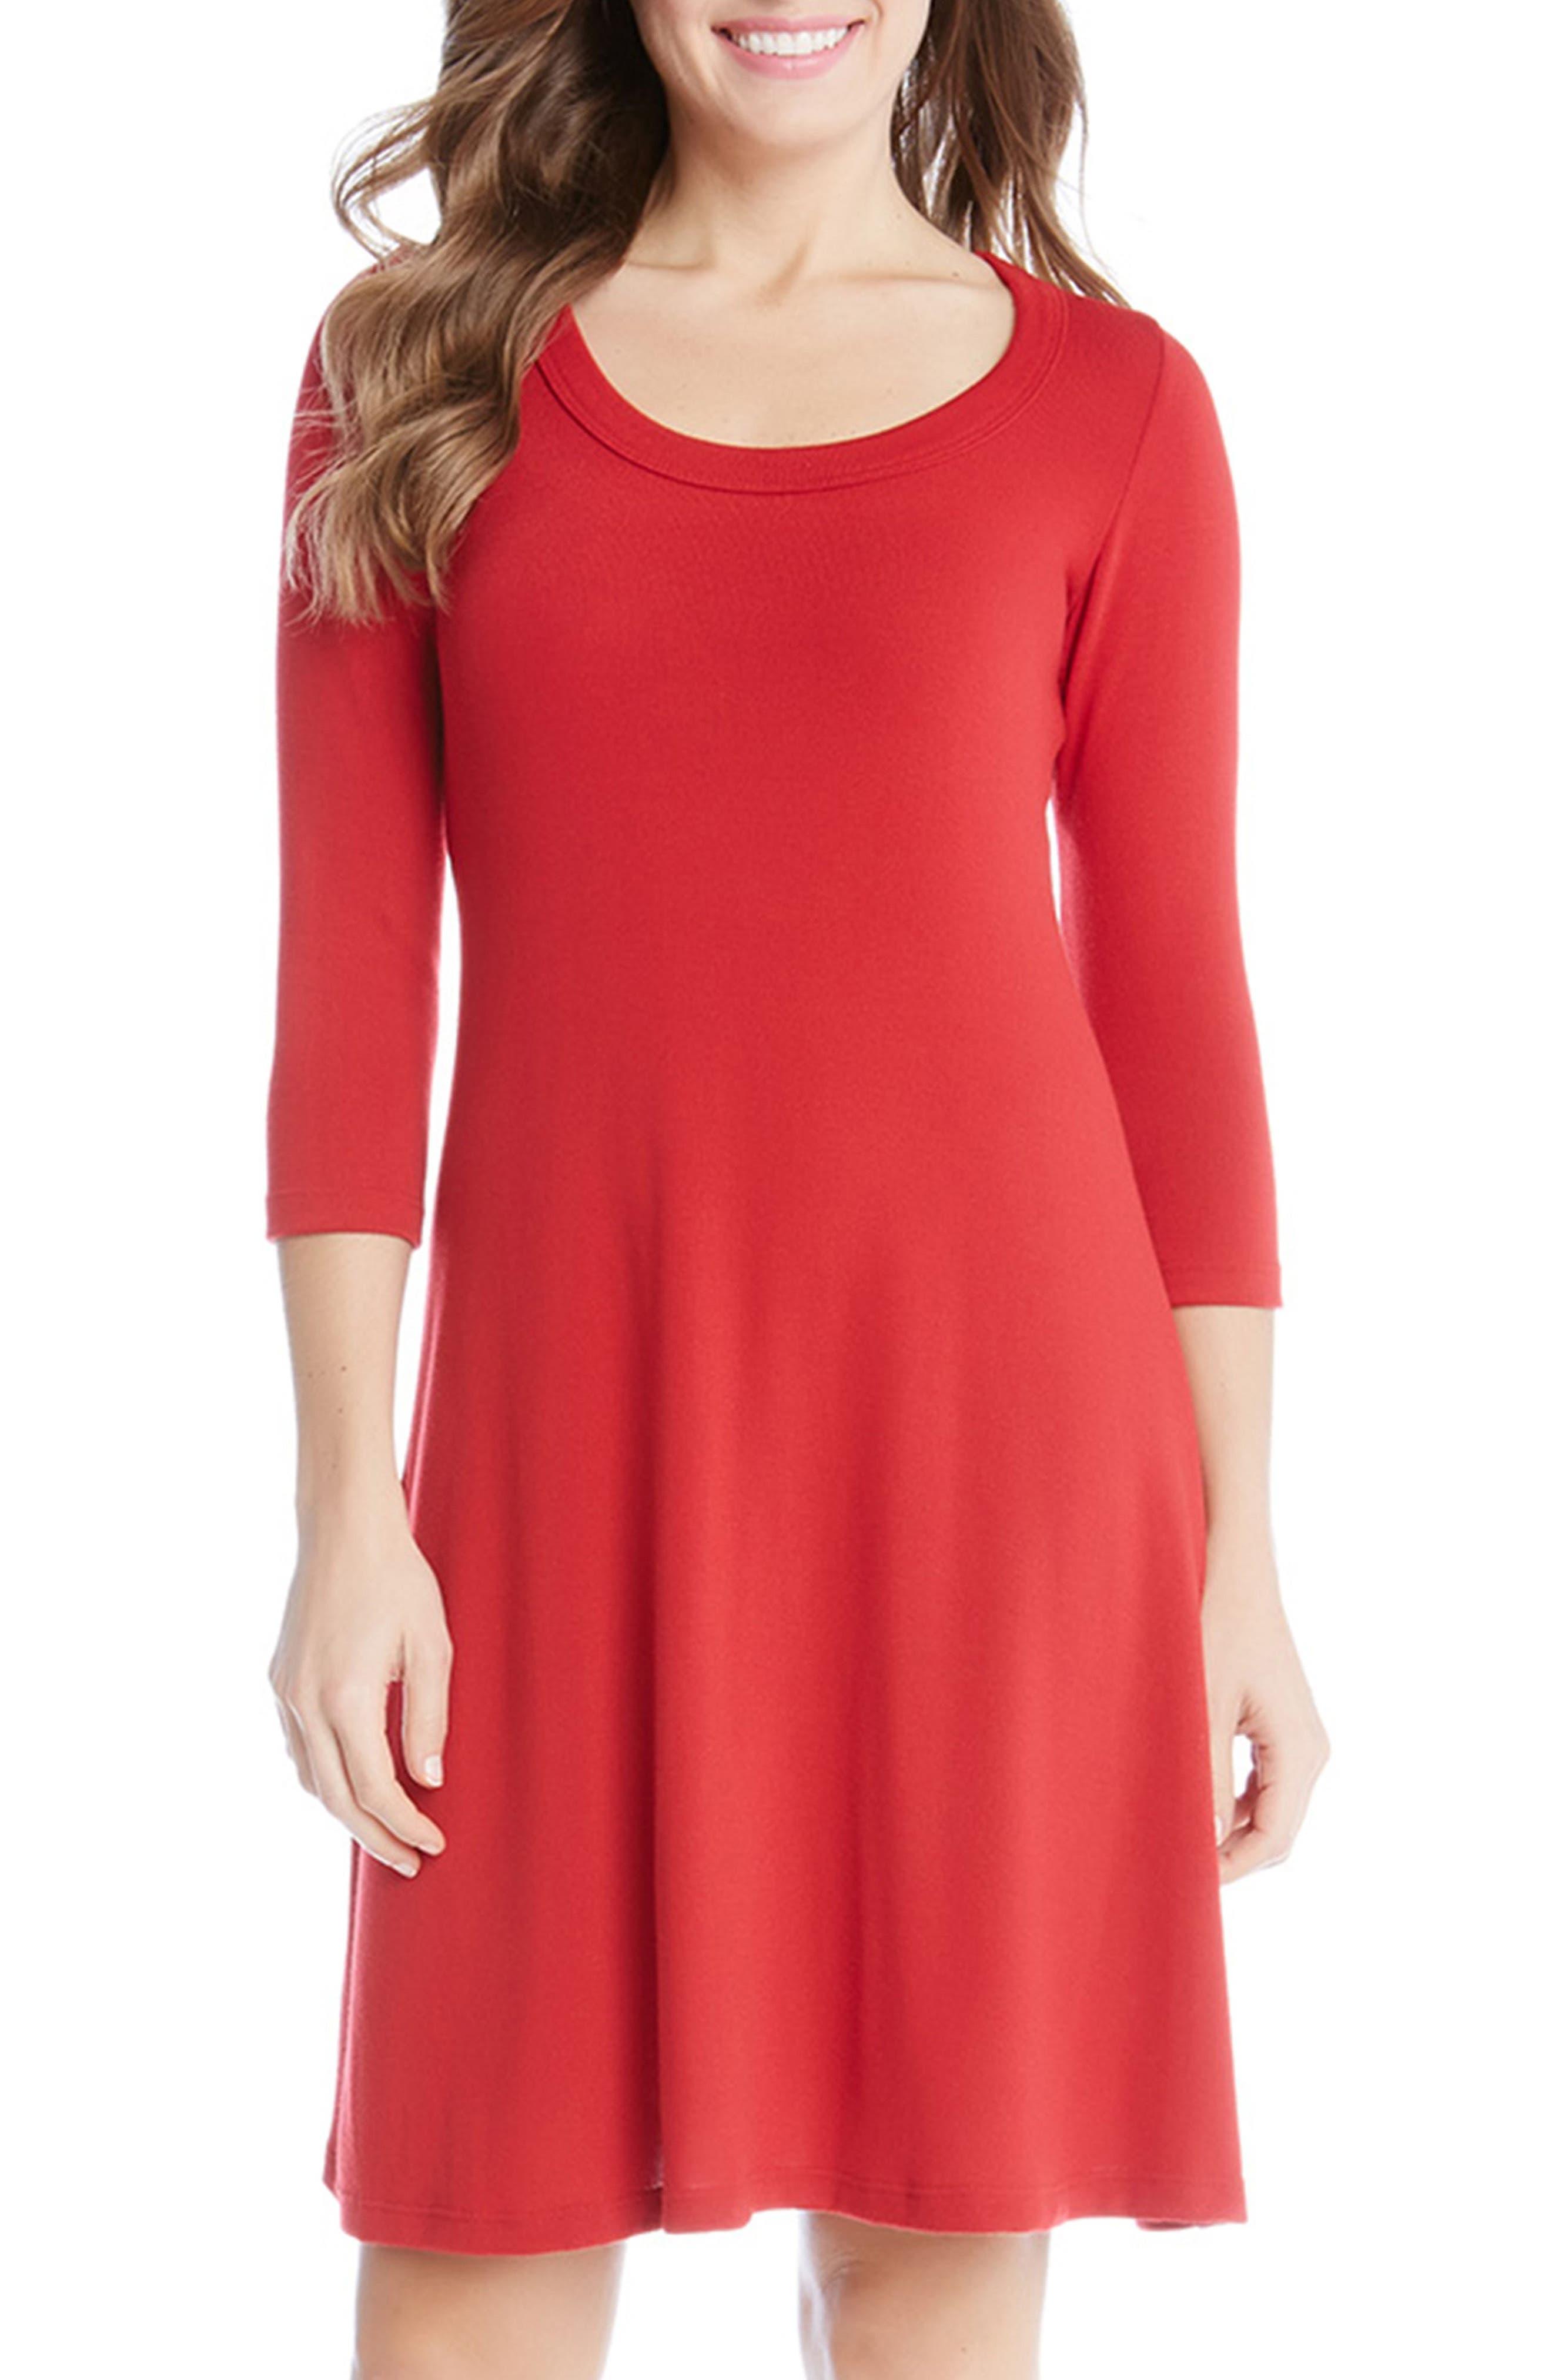 Alternate Image 1 Selected - Karen Kane A-Line Sweater Dress